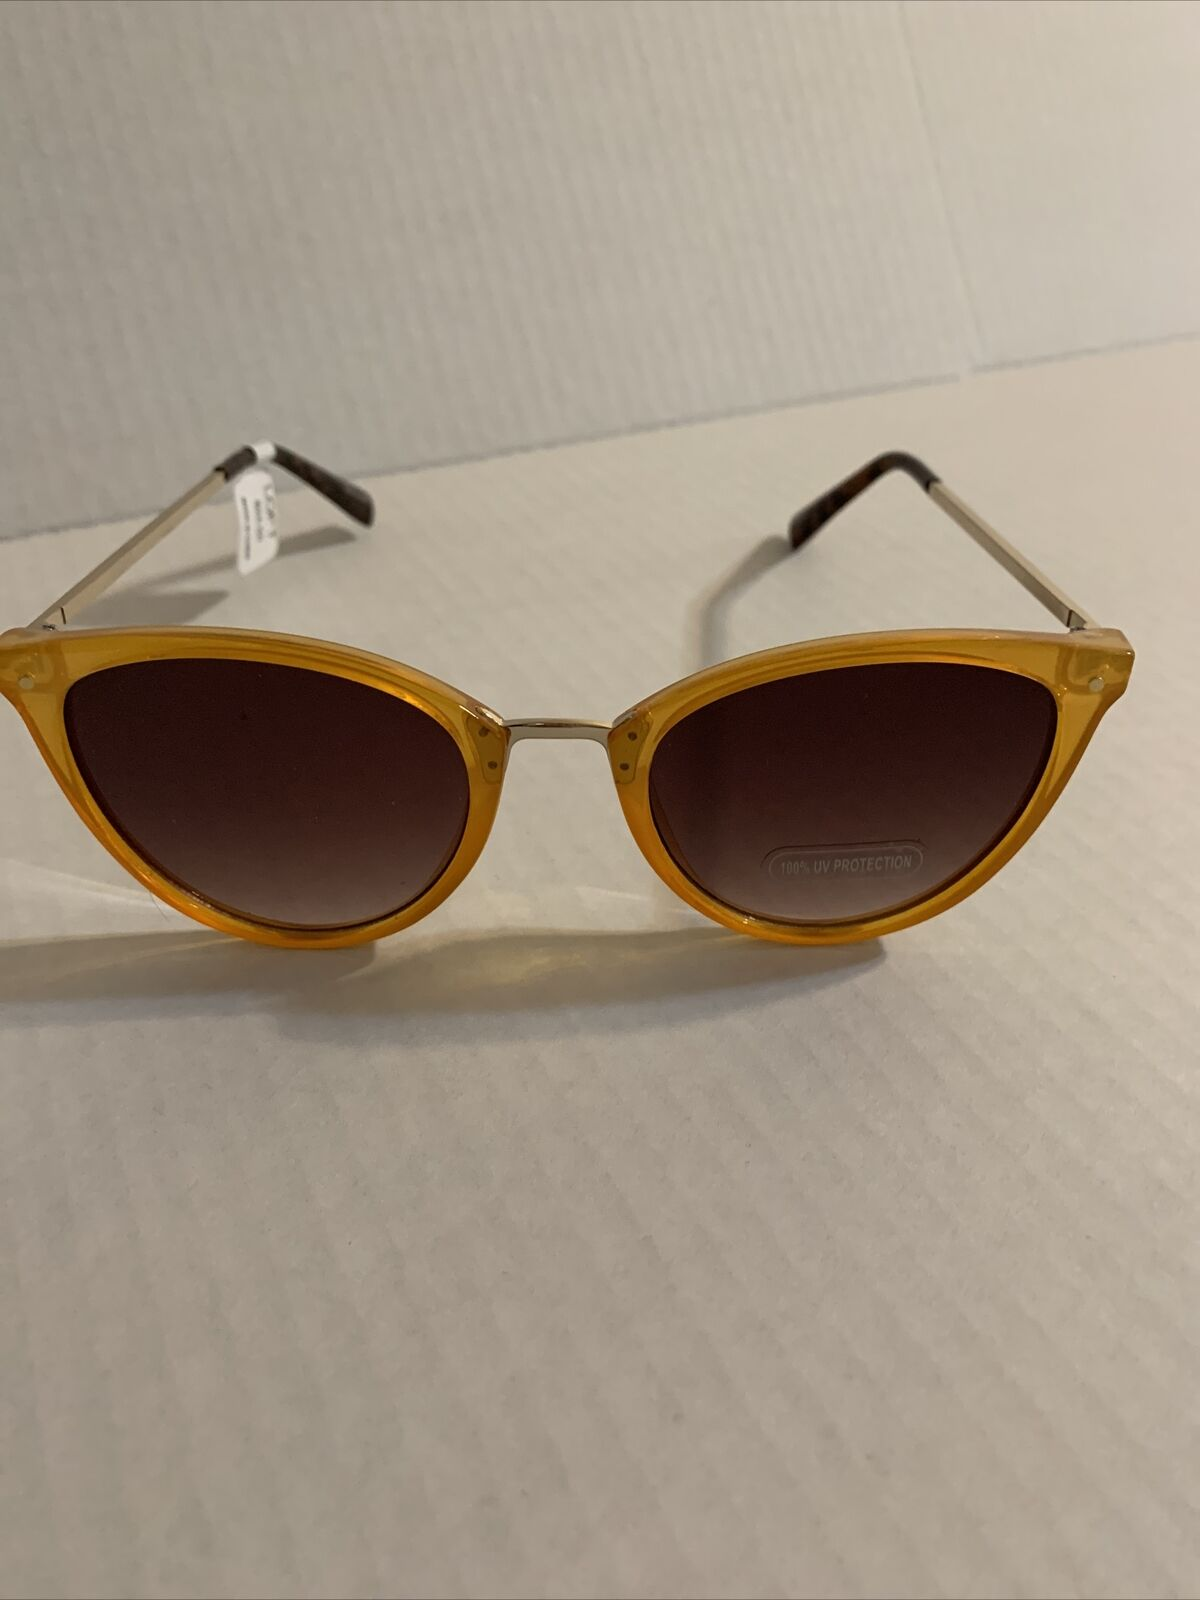 Ann Taylor loft sun glasses J17a